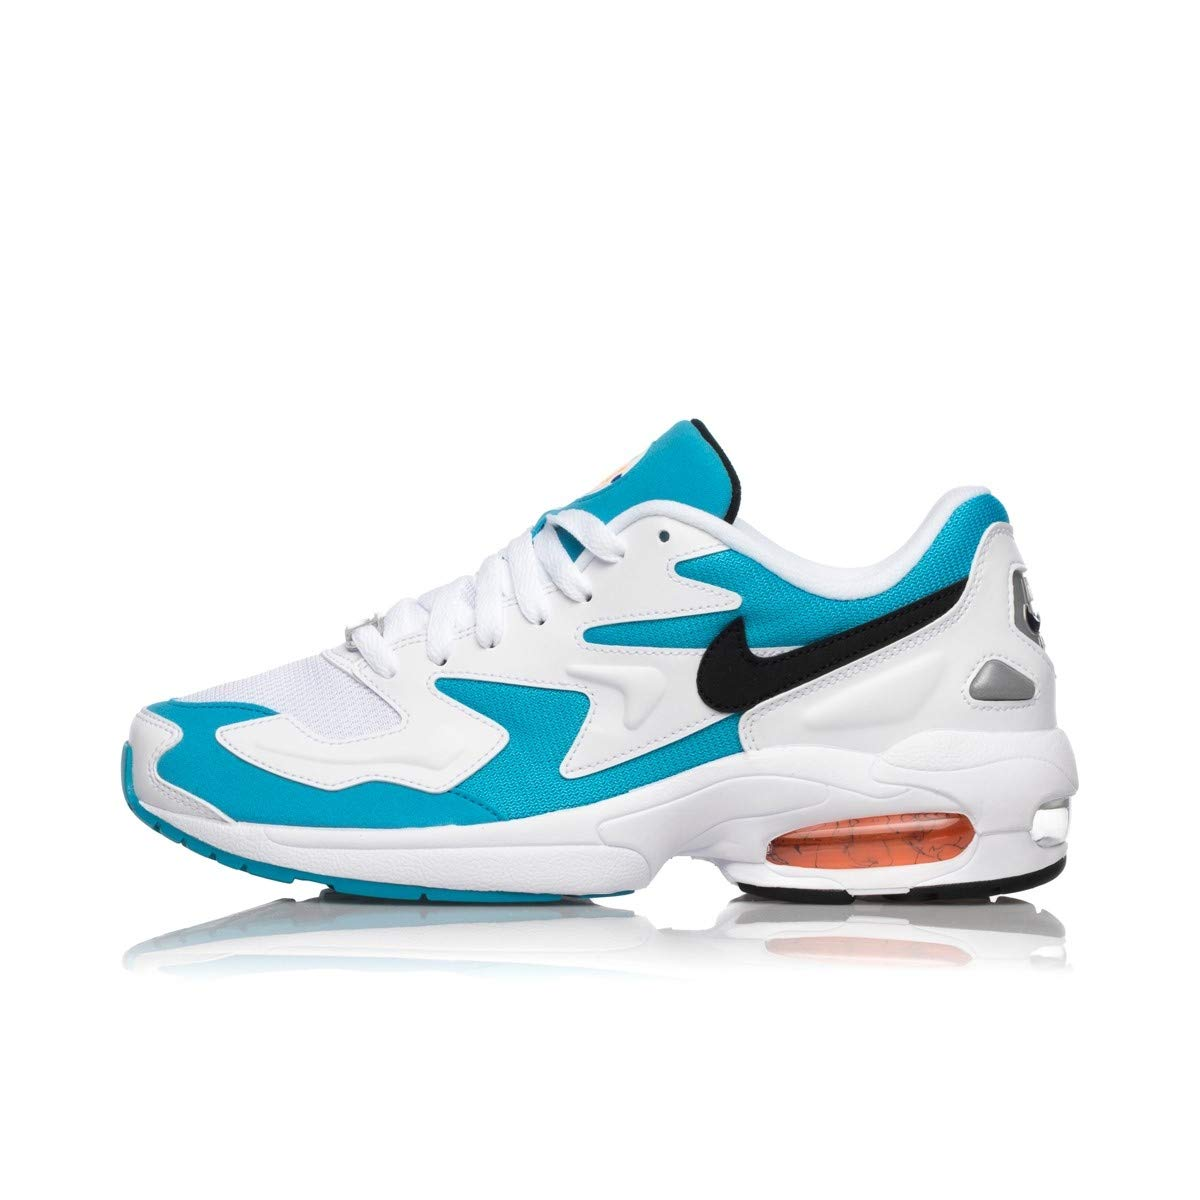 Nike Herren Air Max2 Light Leichtathletikschuhe blau